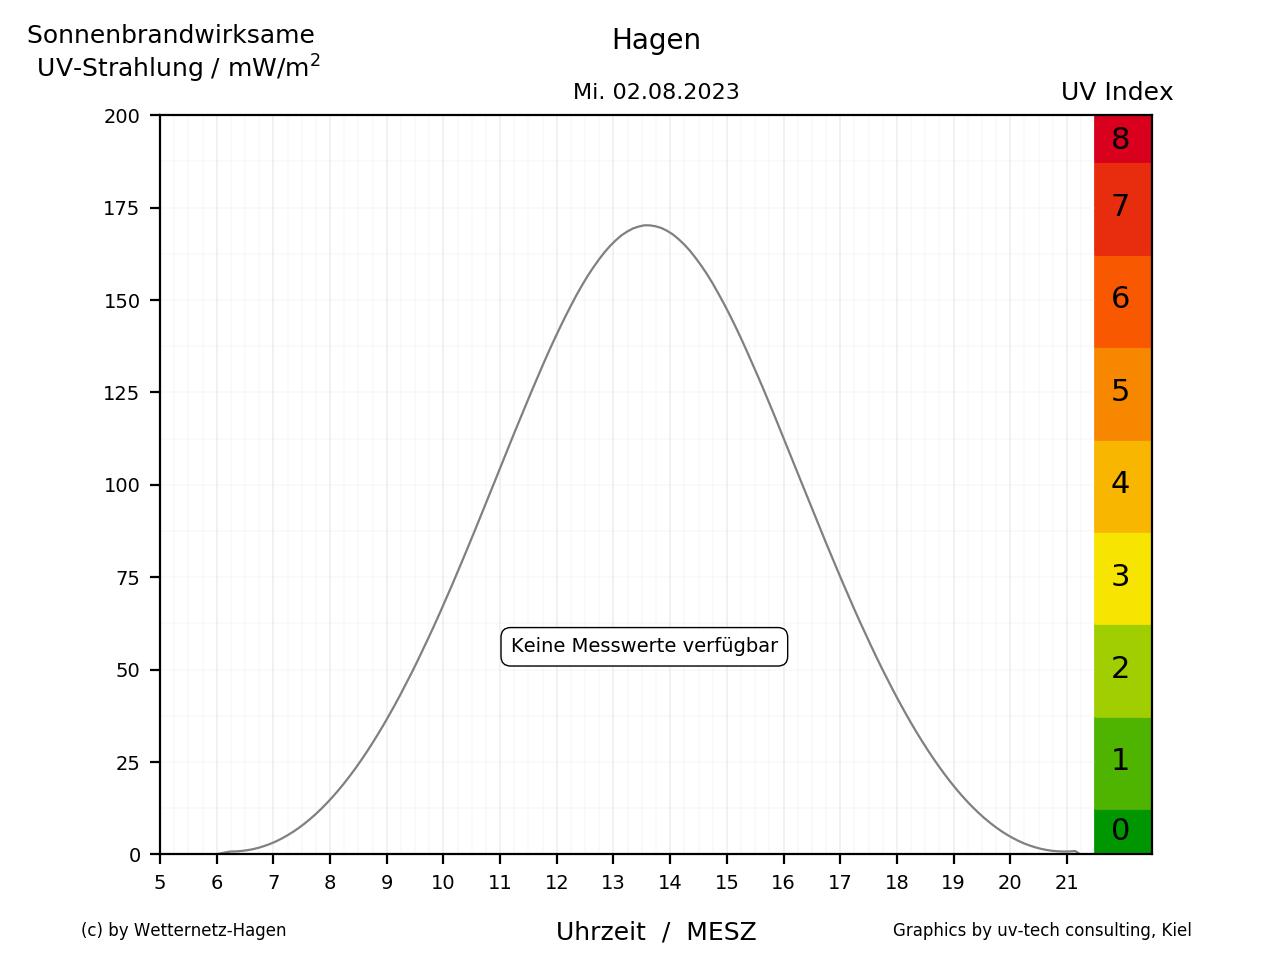 UV-Strahlung in Hagen